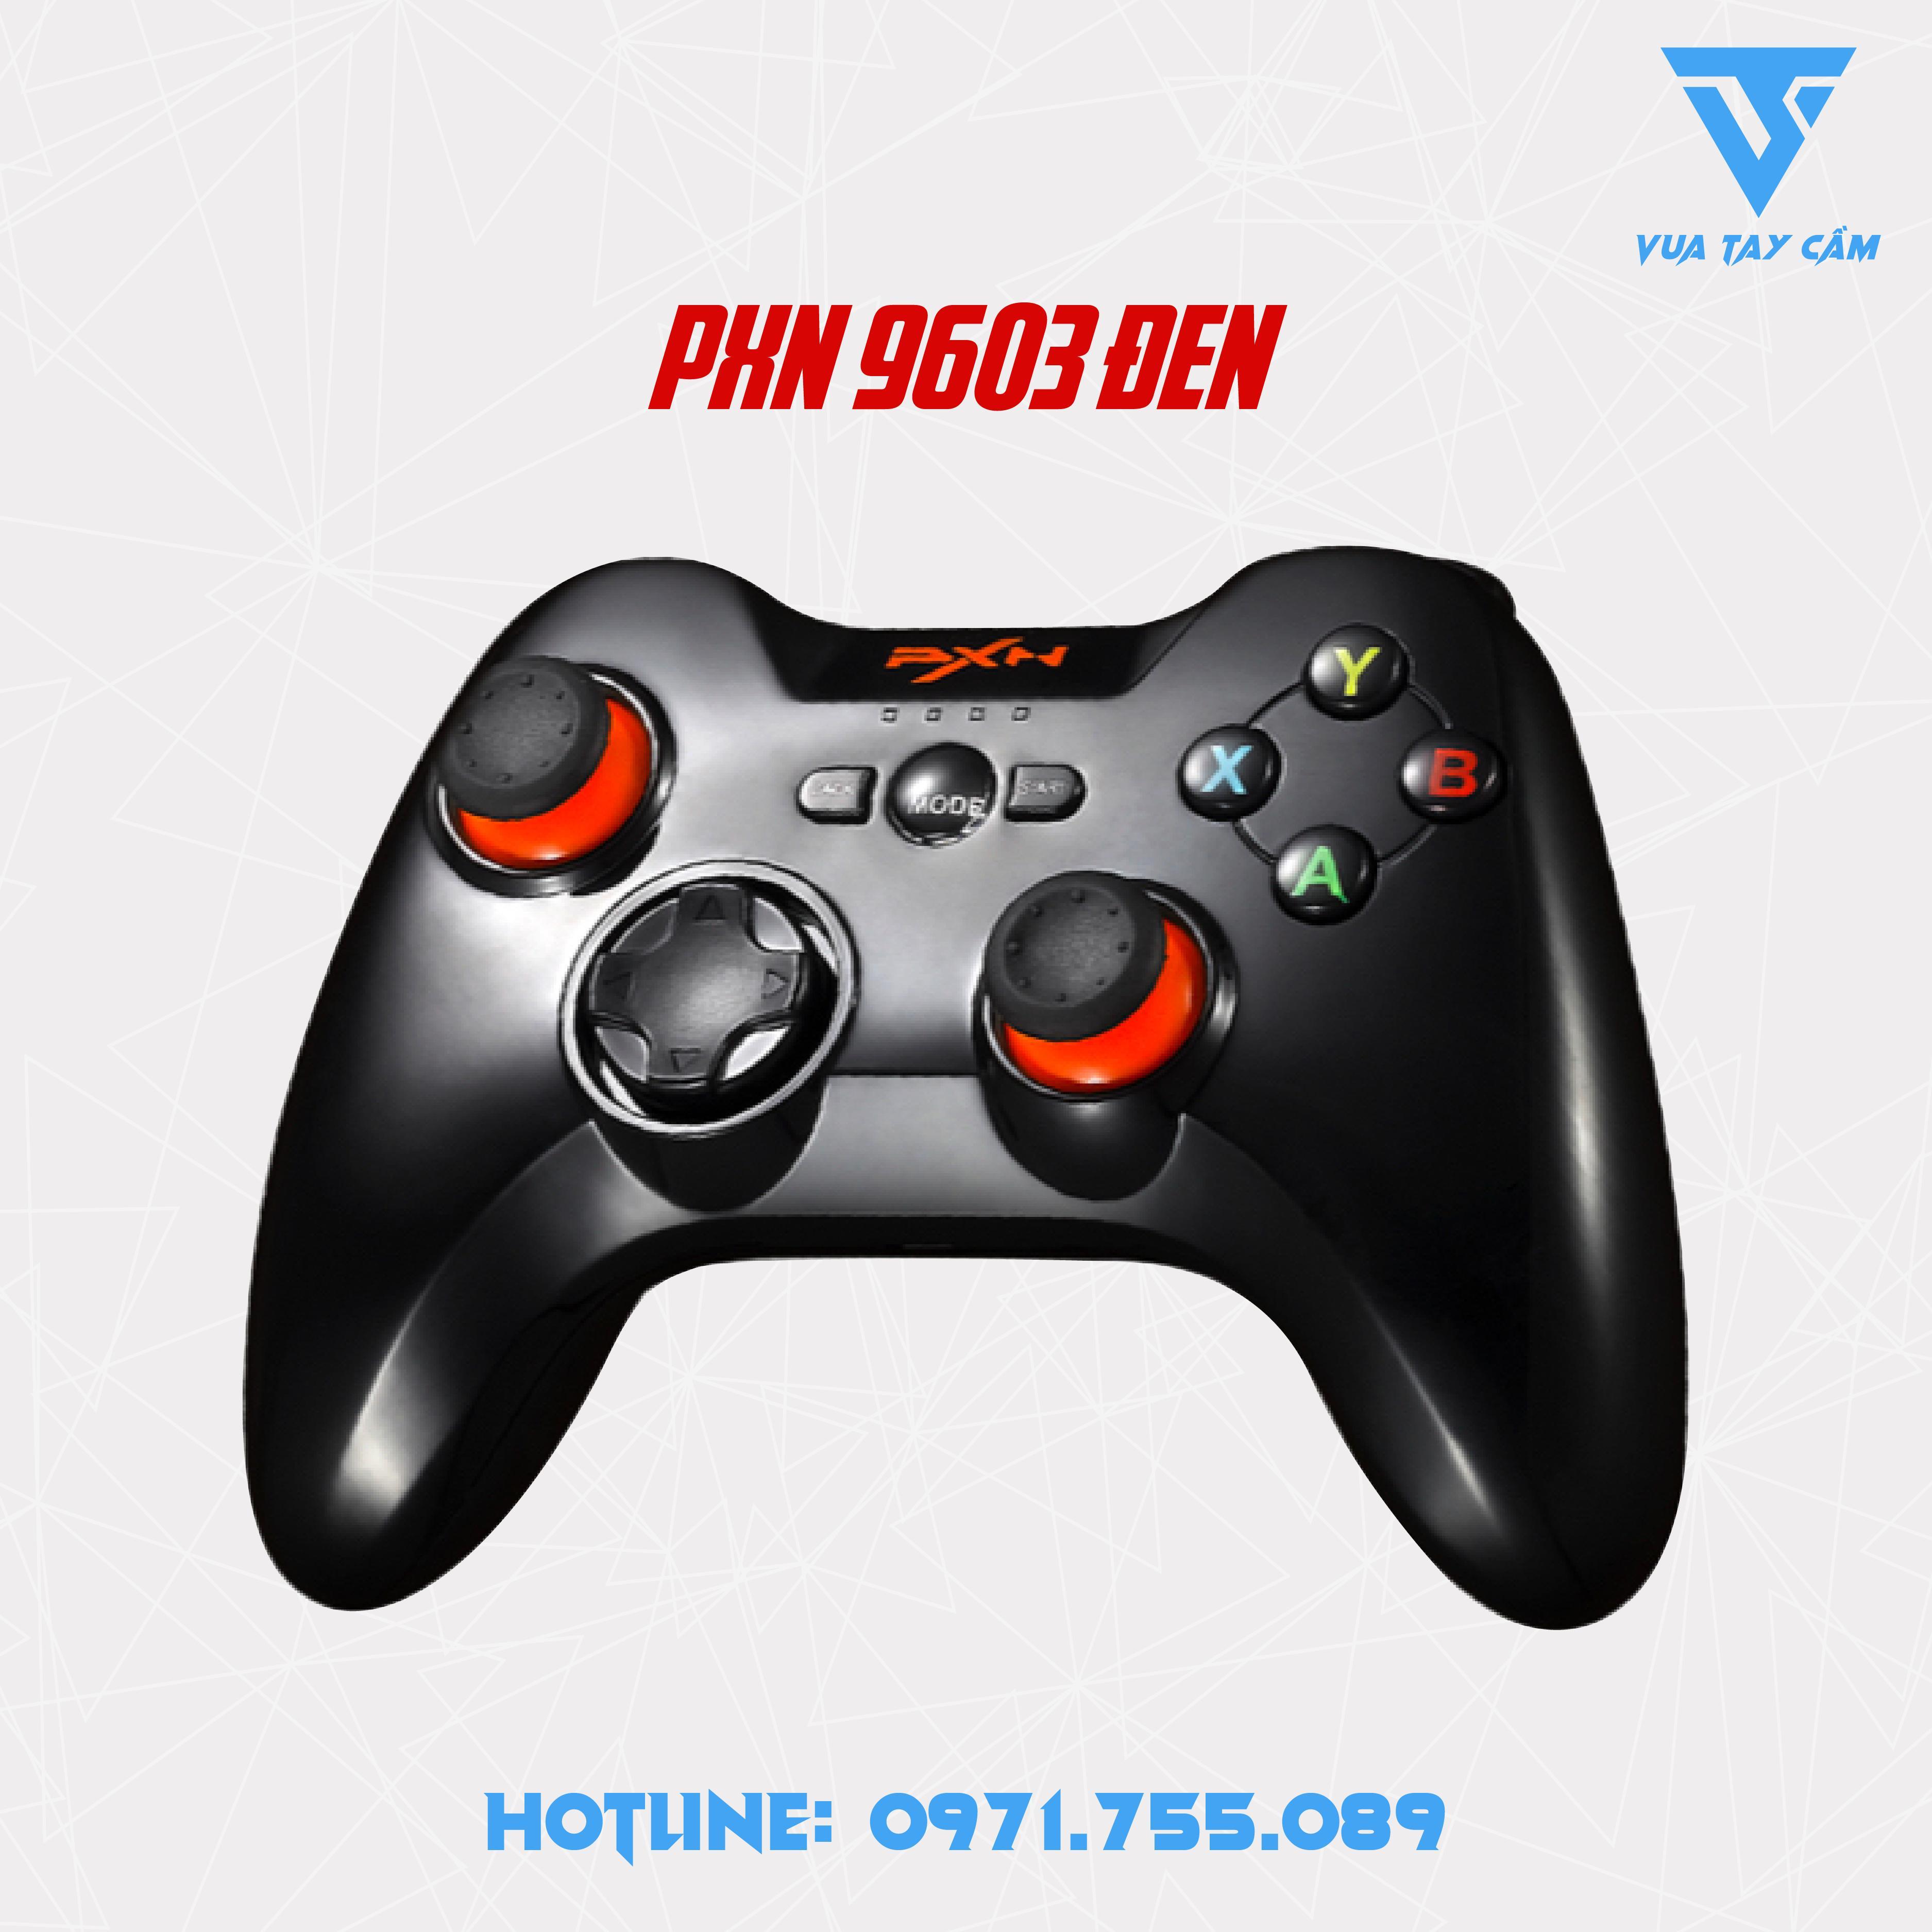 https://api.vuataycam.com/file/1601704288986-838753451-tay-cam-choi-game-pxn.jpg